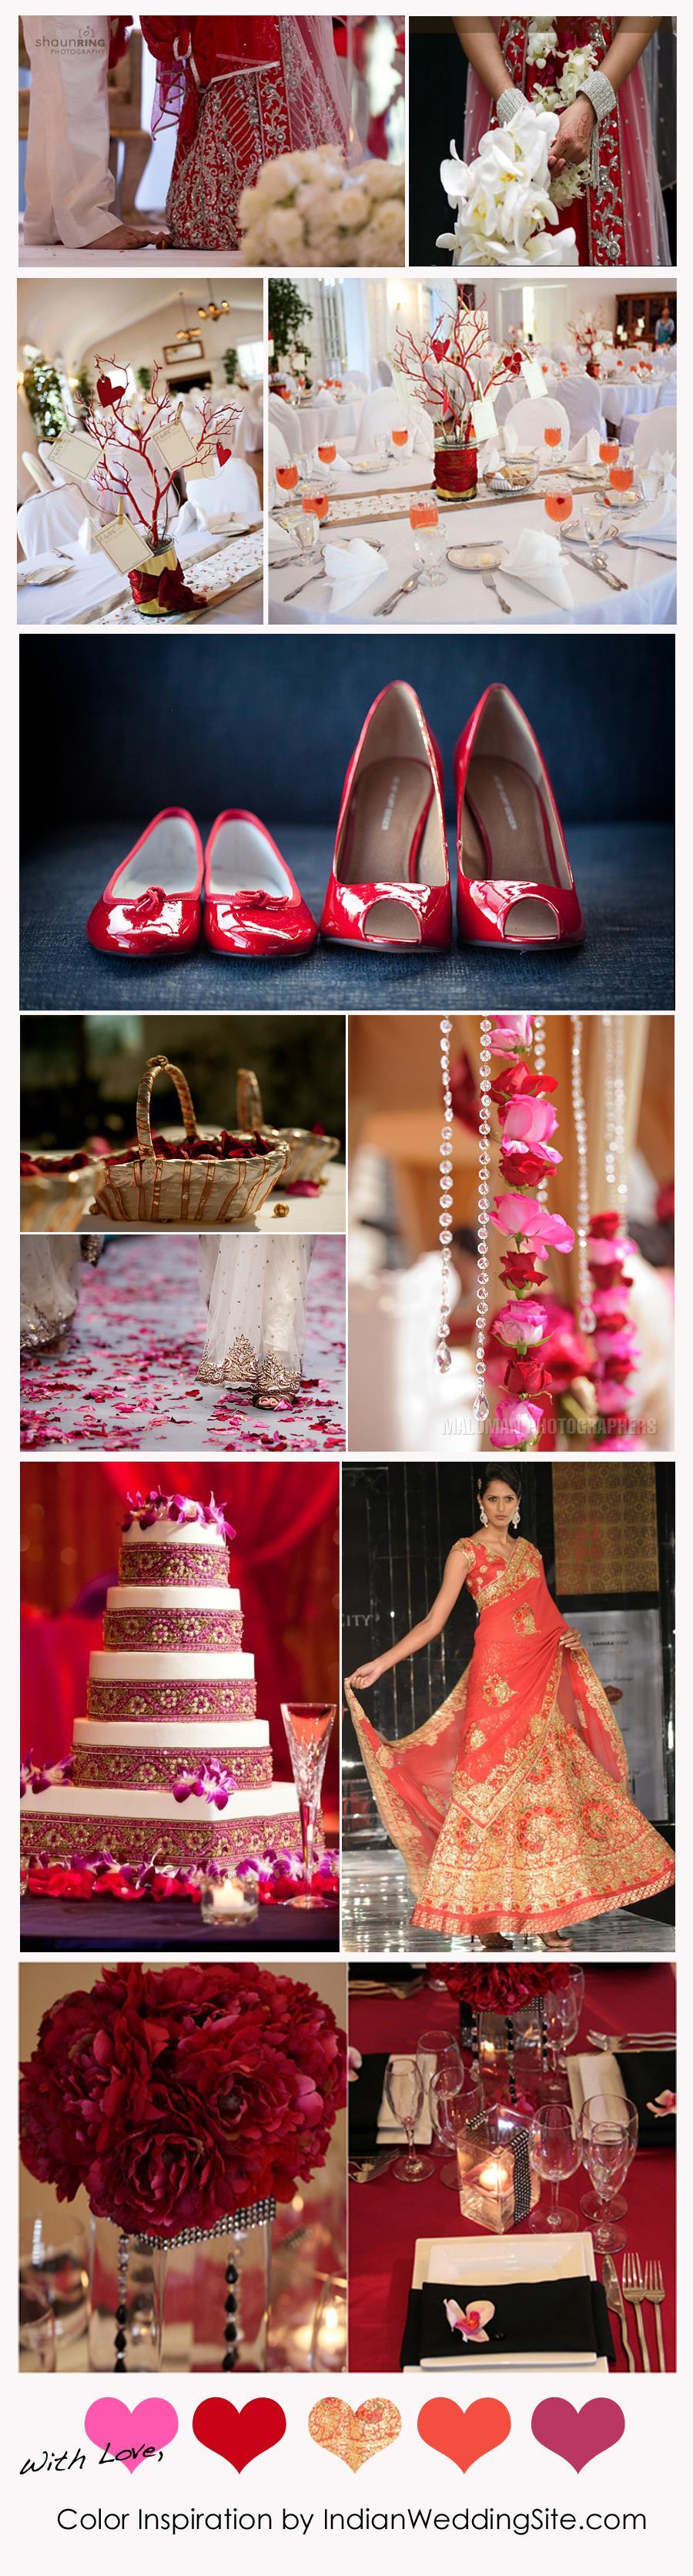 Indian Wedding Color Inspiration - Valentine